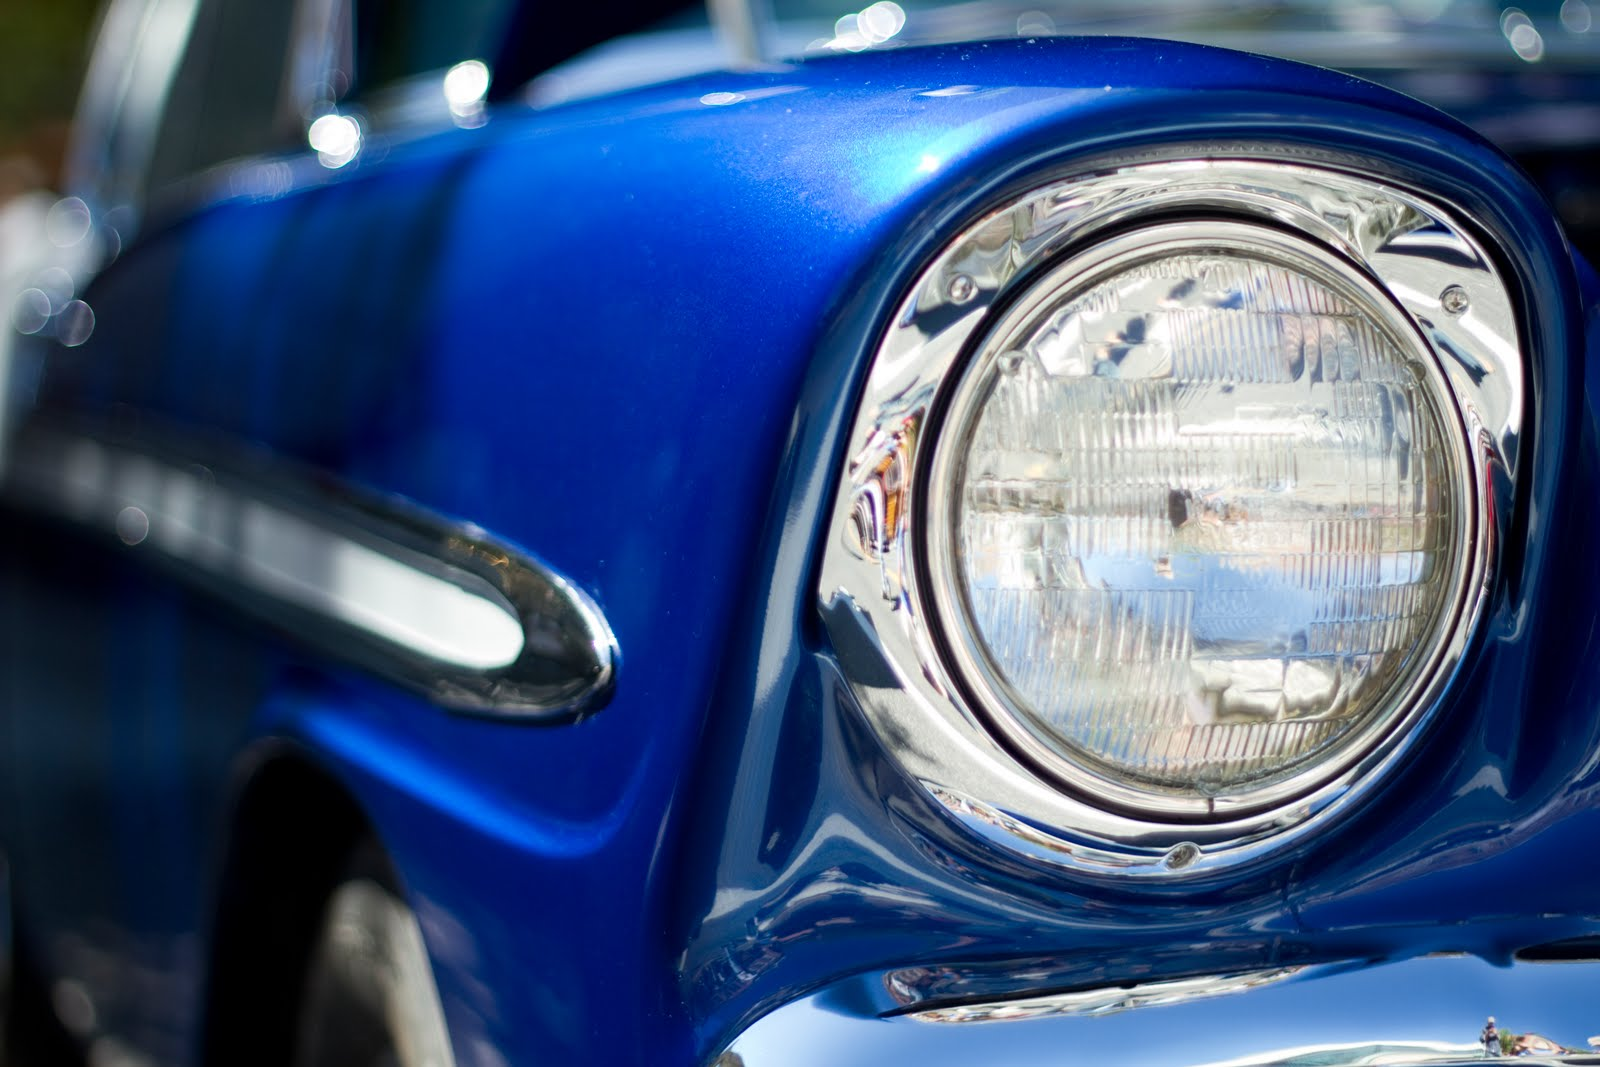 Bozeman Car Show Indianapolis Photographer Casey And Her Camera - Car show in indianapolis this weekend